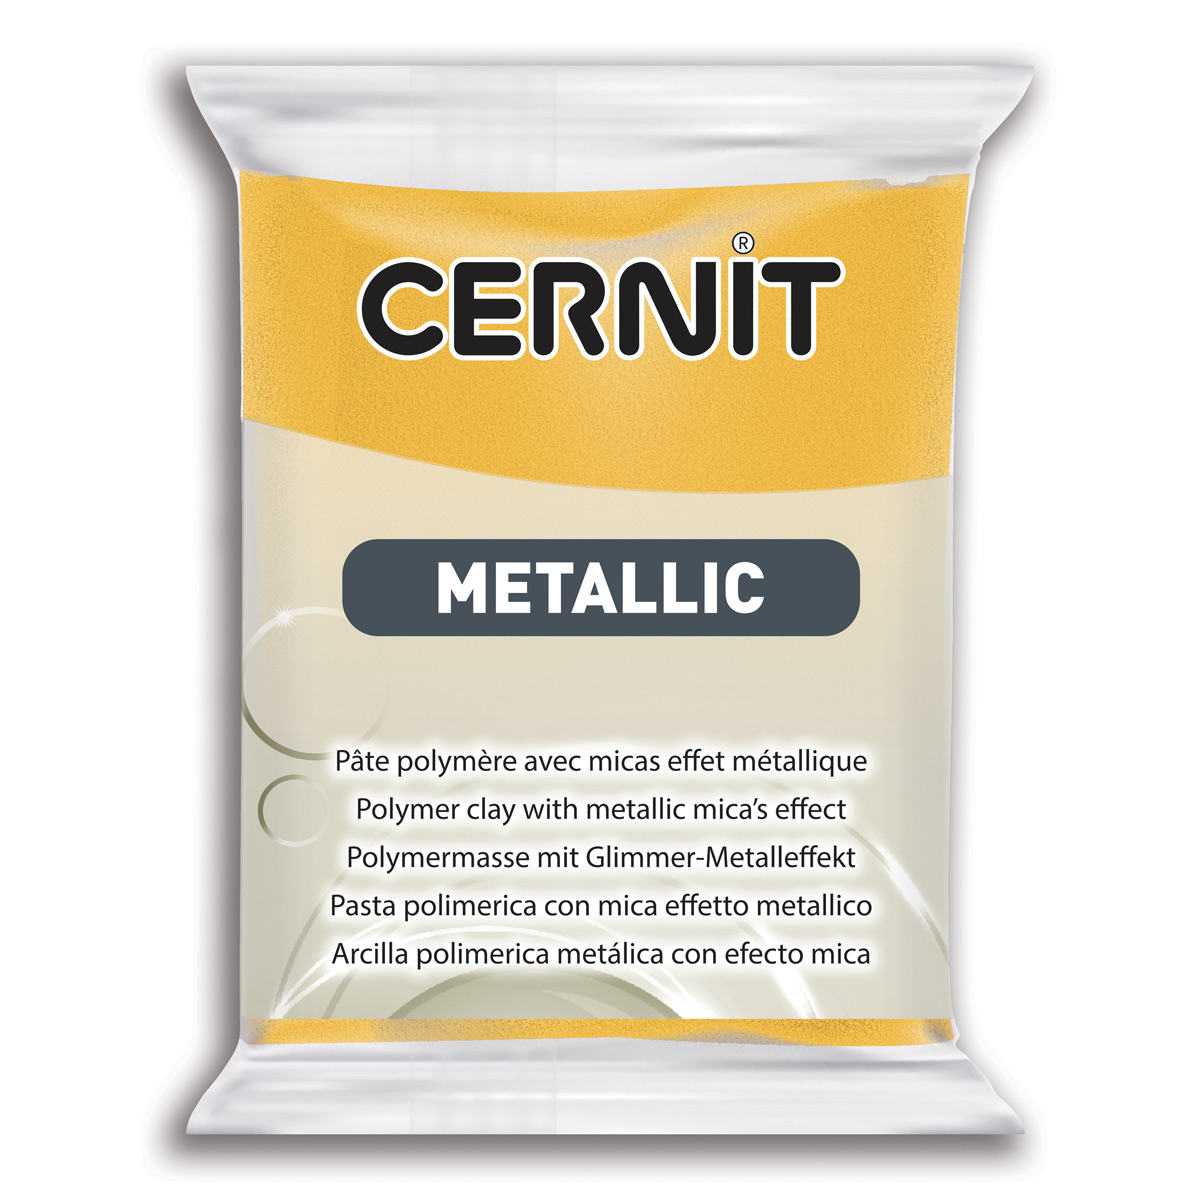 Купить 7724713, Пластика Cernit Metallic, 56 грамм, цвет 700 желтый, арт. CE0870056,